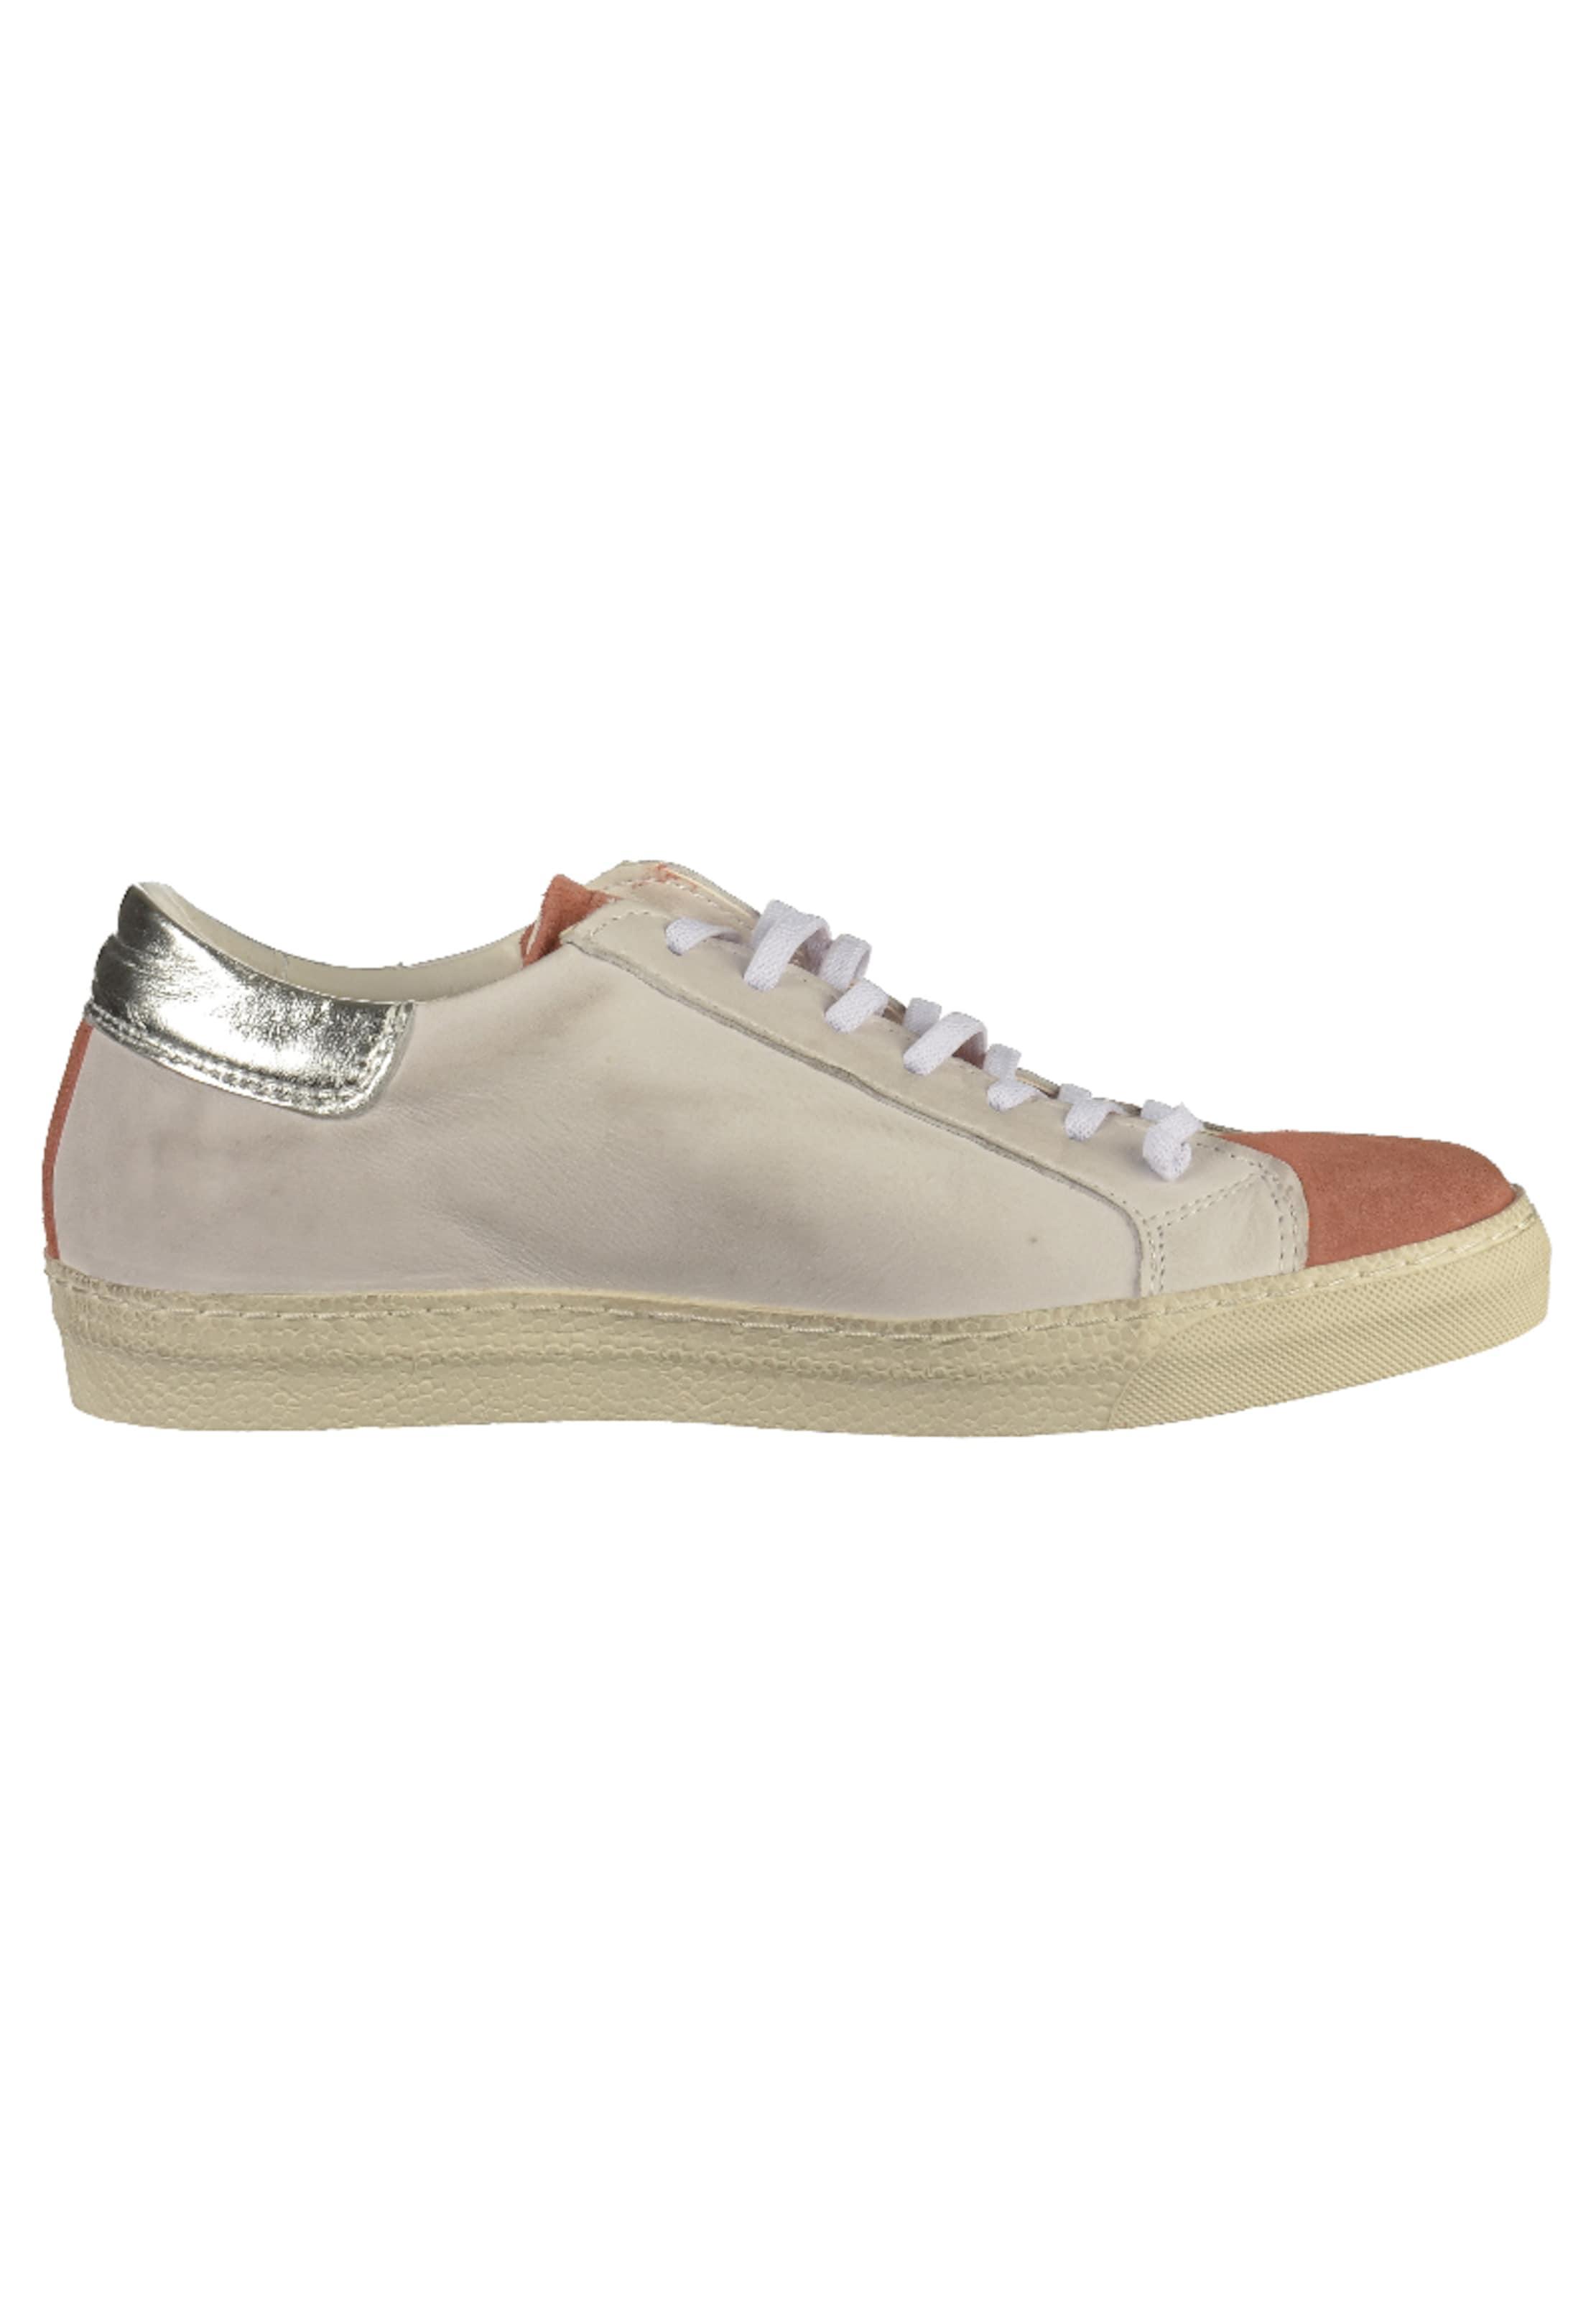 Liefern Klassische Online-Verkauf MUSTANG Sneaker YAXOS